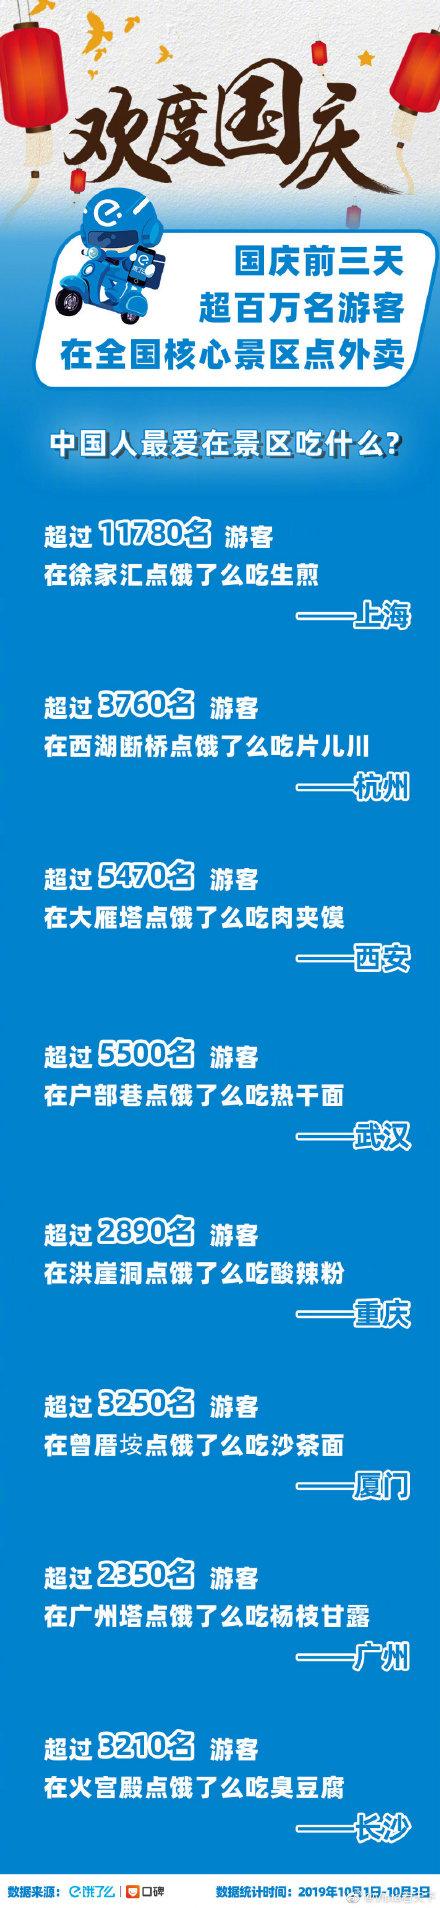 <b>饿了么:国庆前三天超百万名游客在景区点外卖</b>